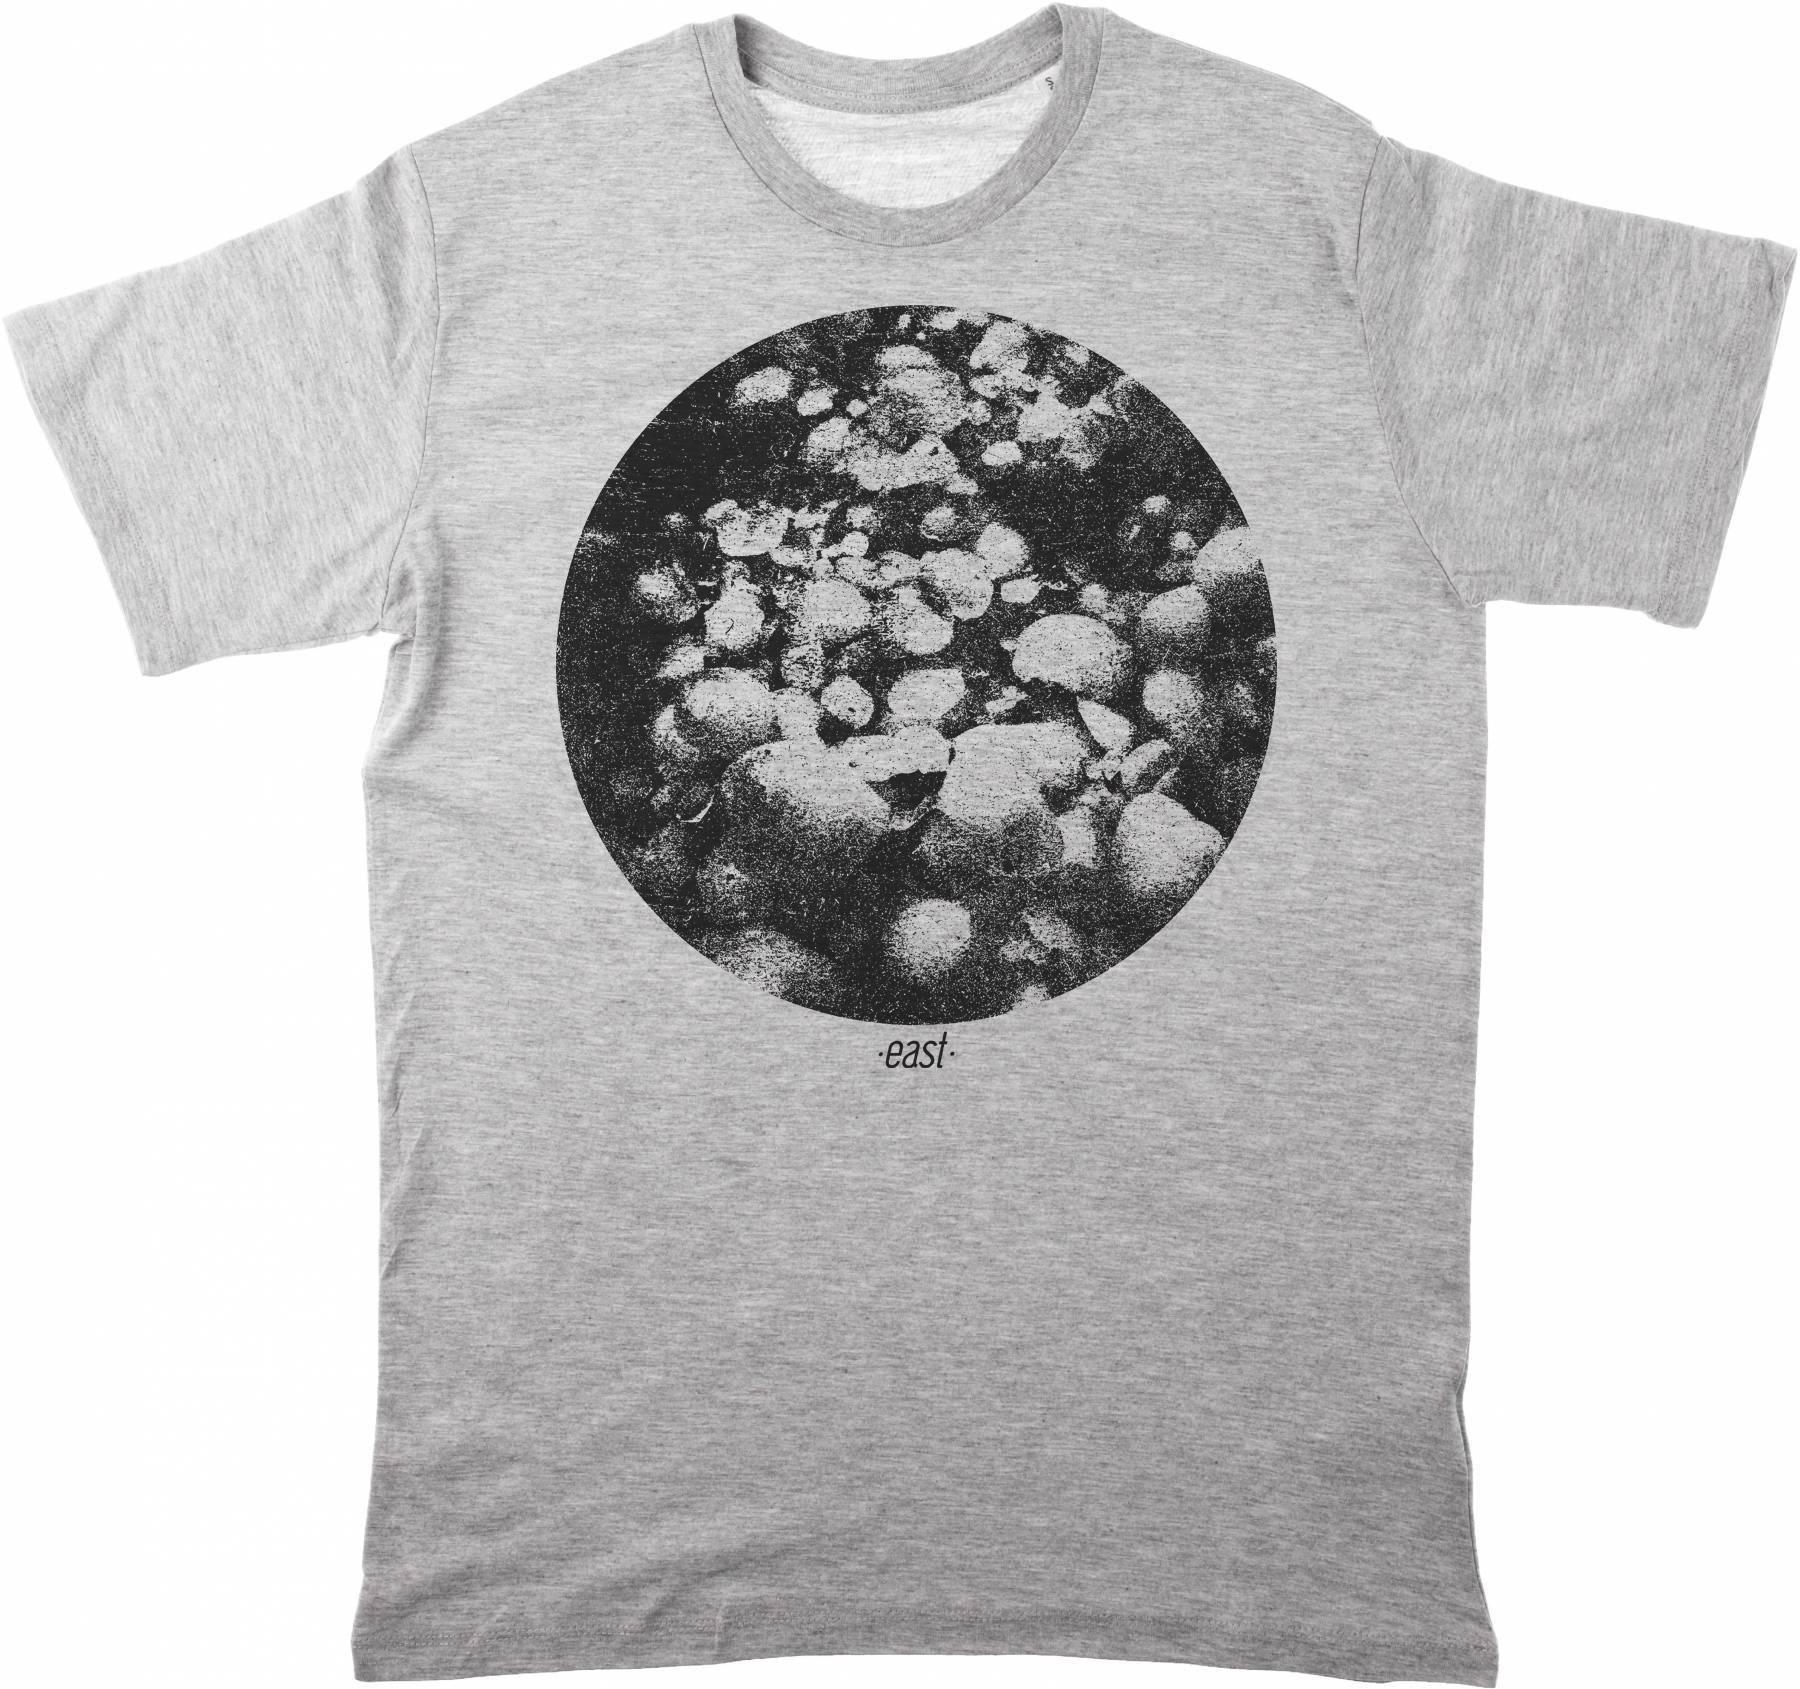 East_CircleStone_Shirt_web